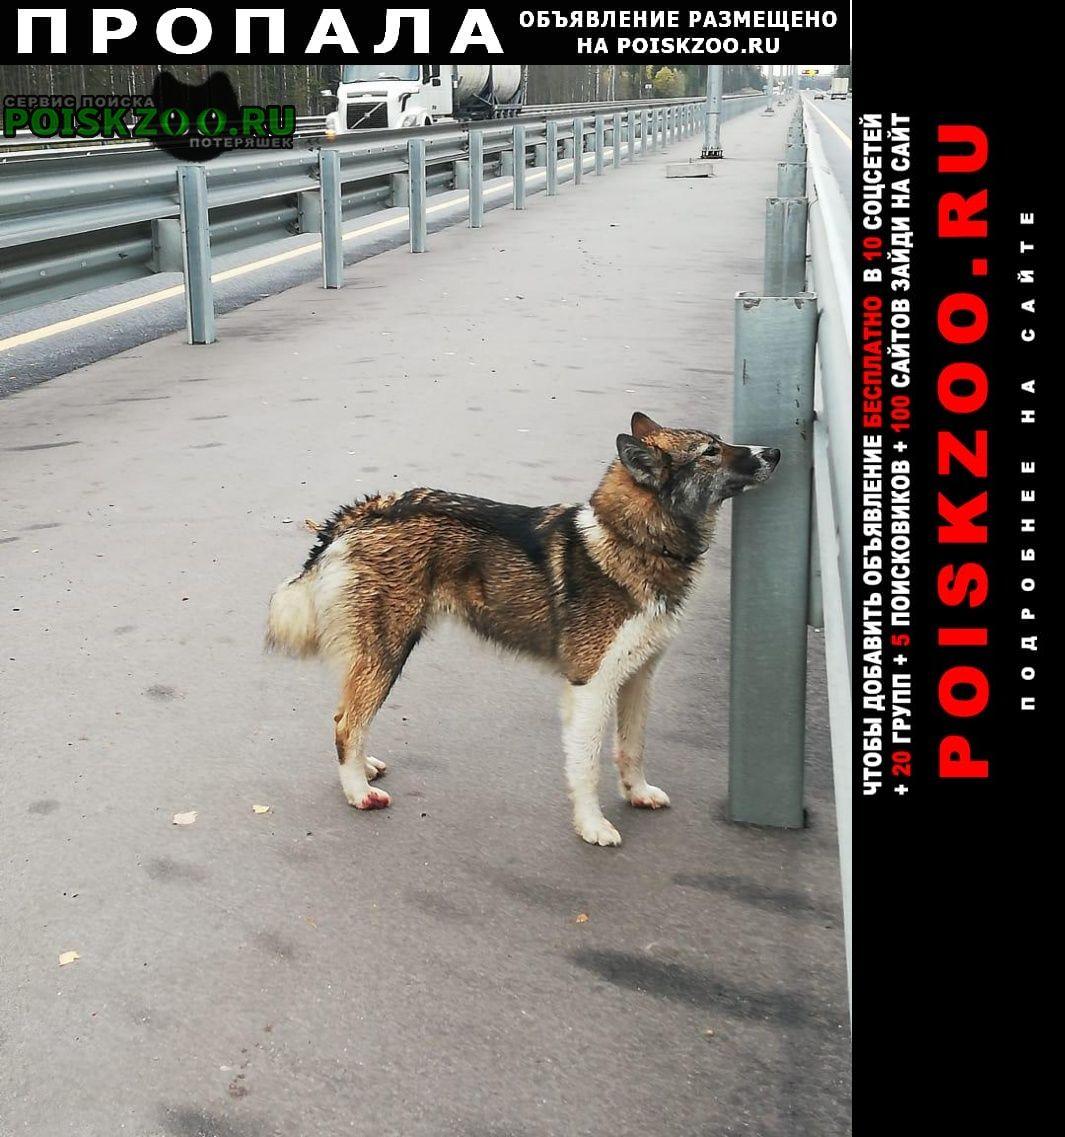 Пропала собака Тосно